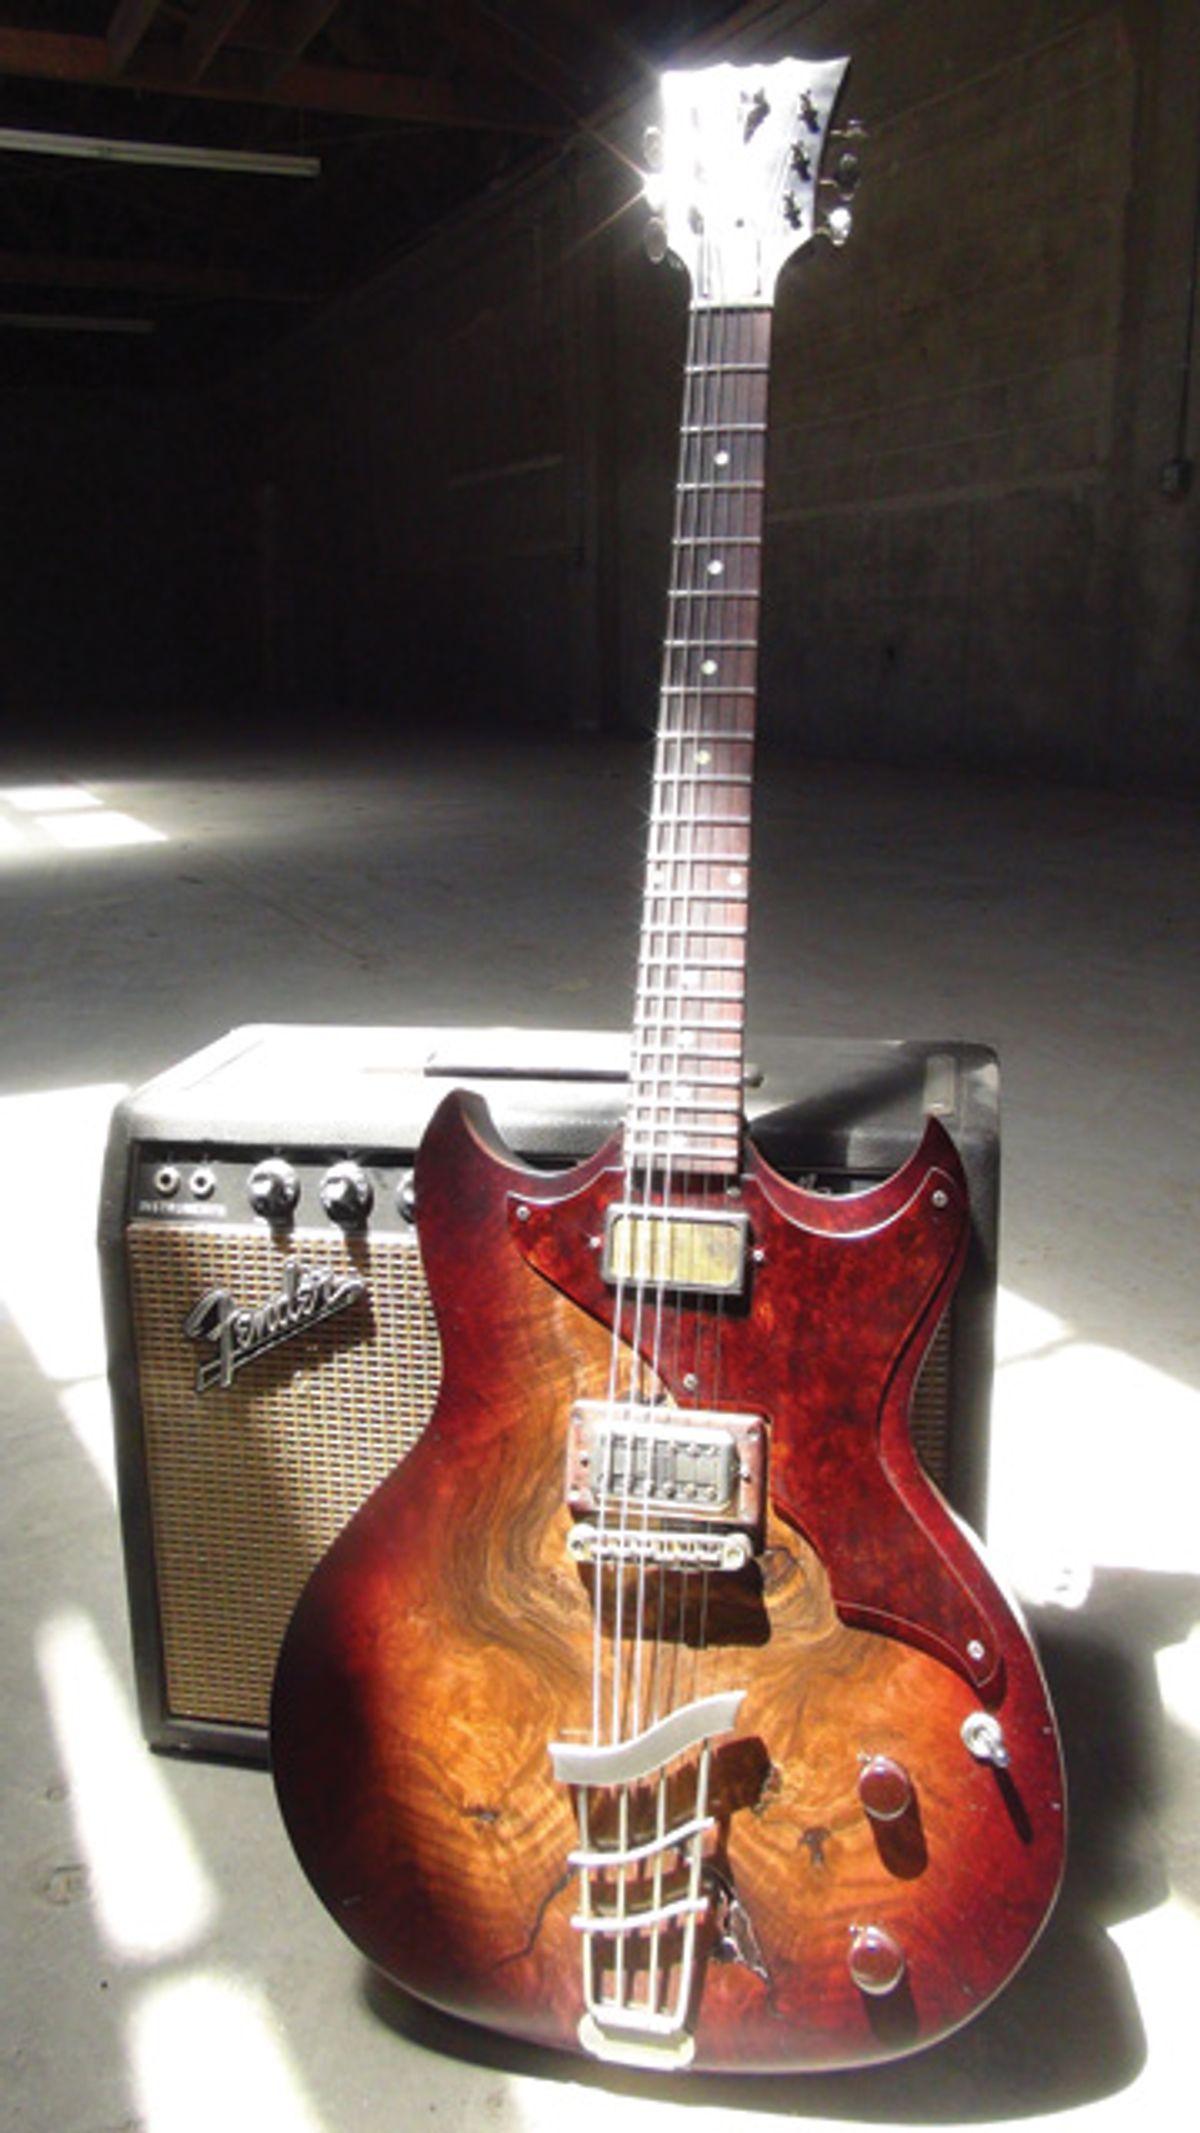 Guitar of the Month: Josh Homme's Echopark Custom Crow